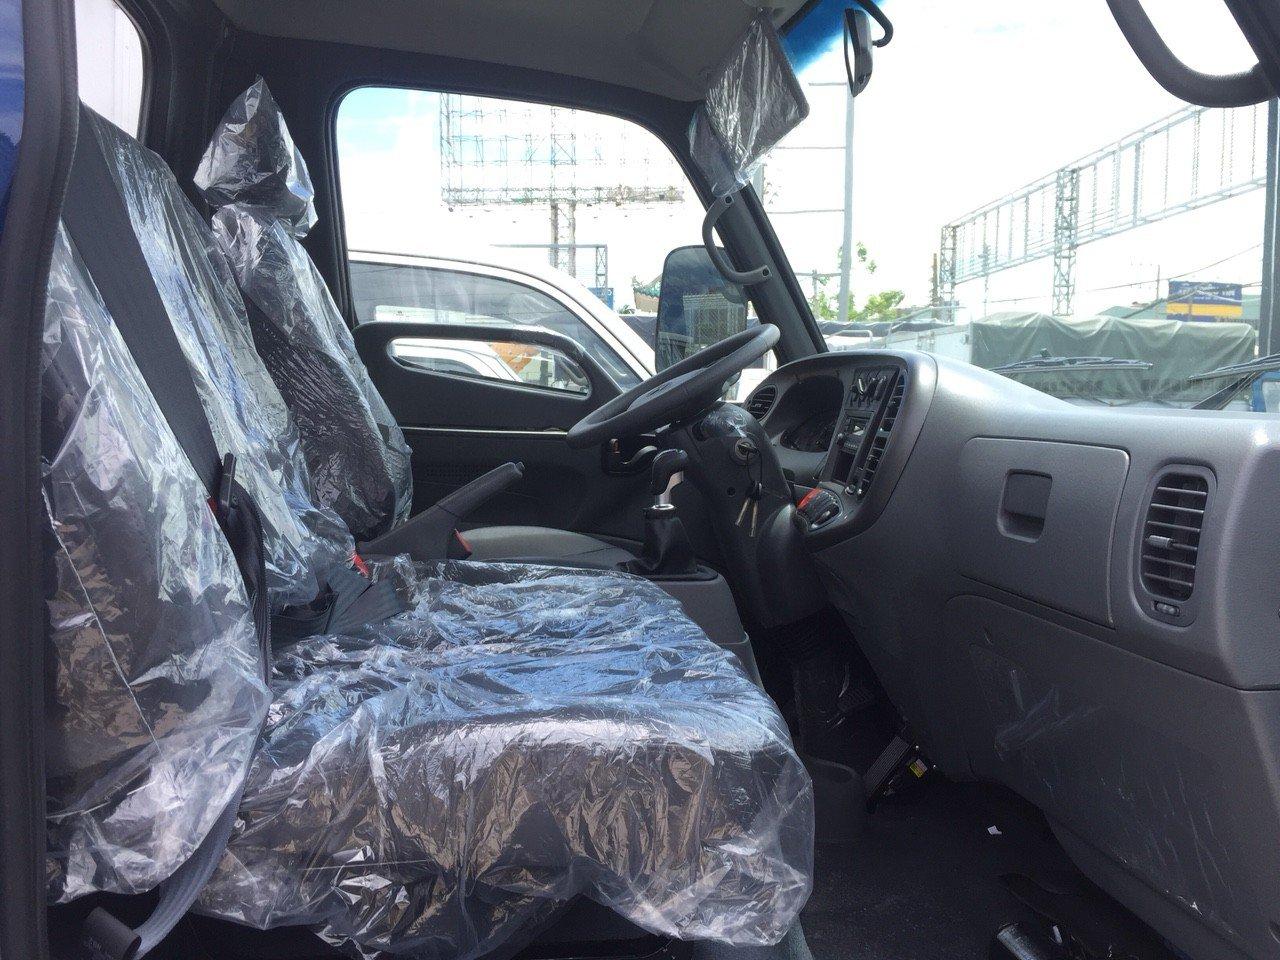 khoang lái 110xl